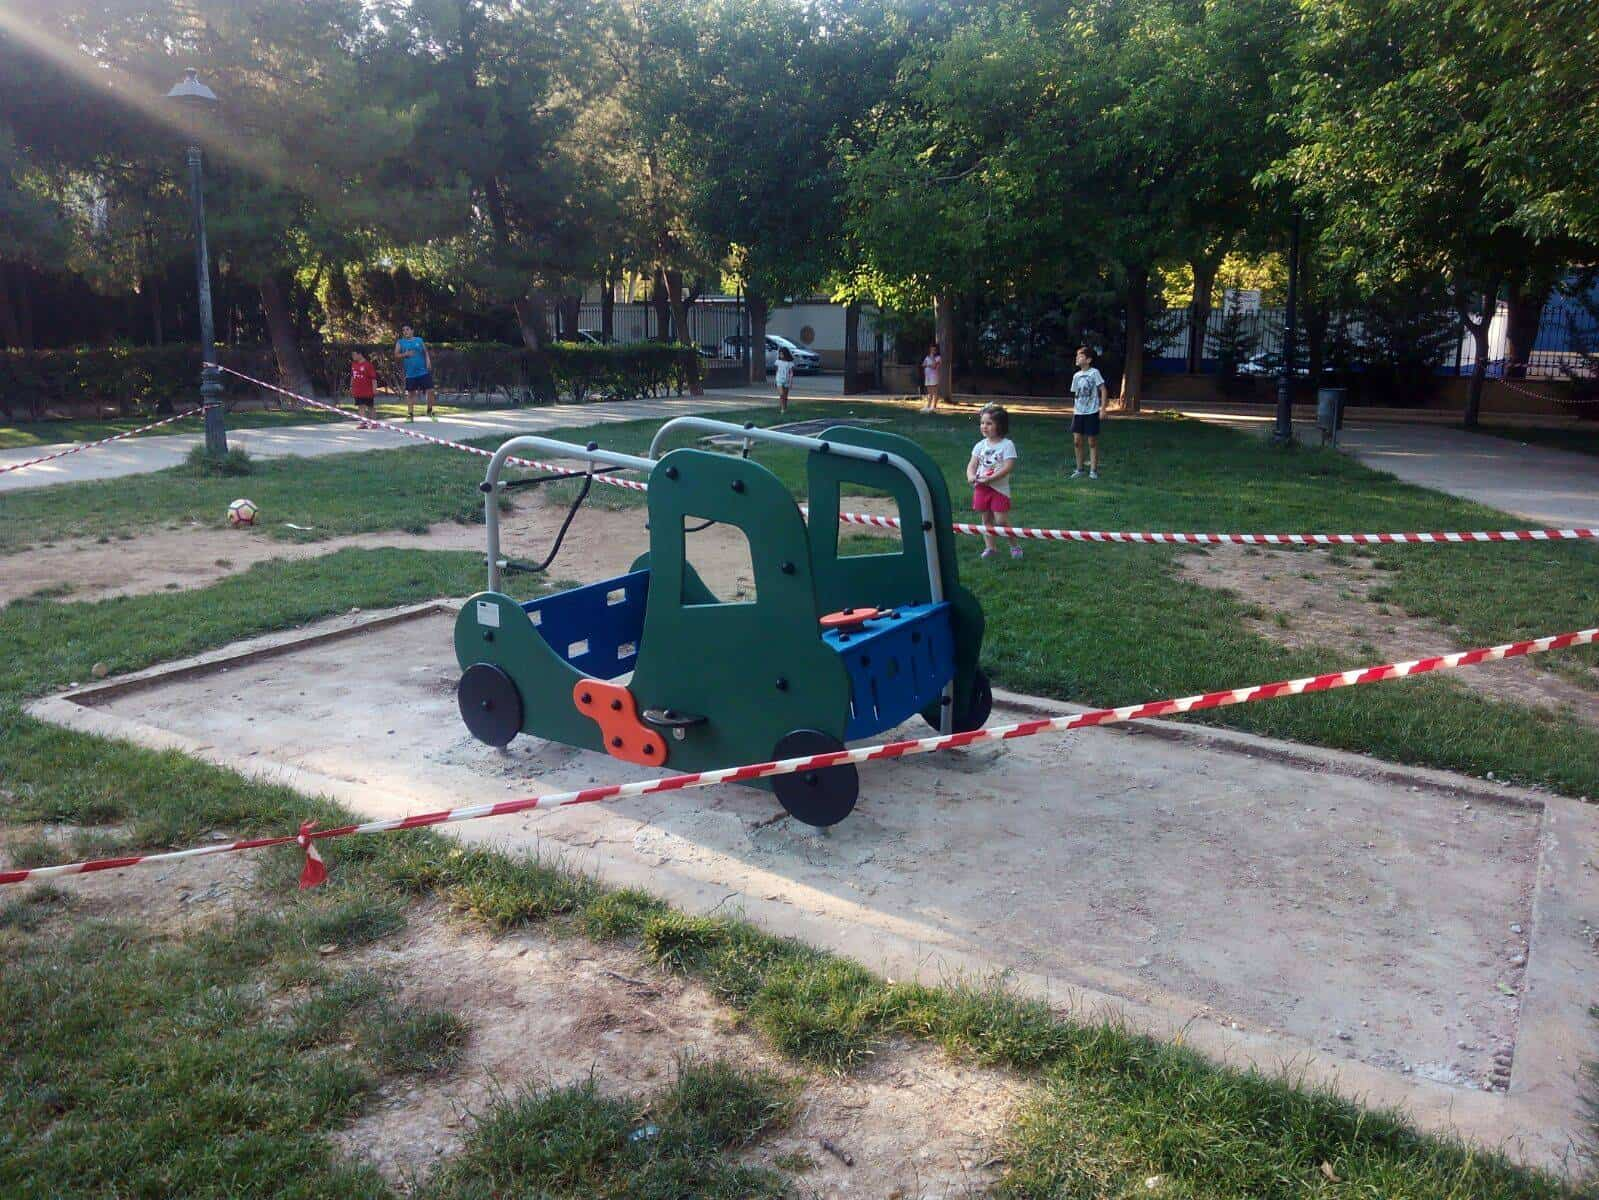 renovada zona infantil parque municipal herencia 2 - Renovada la zona infantil del Parque Municipal de Herencia